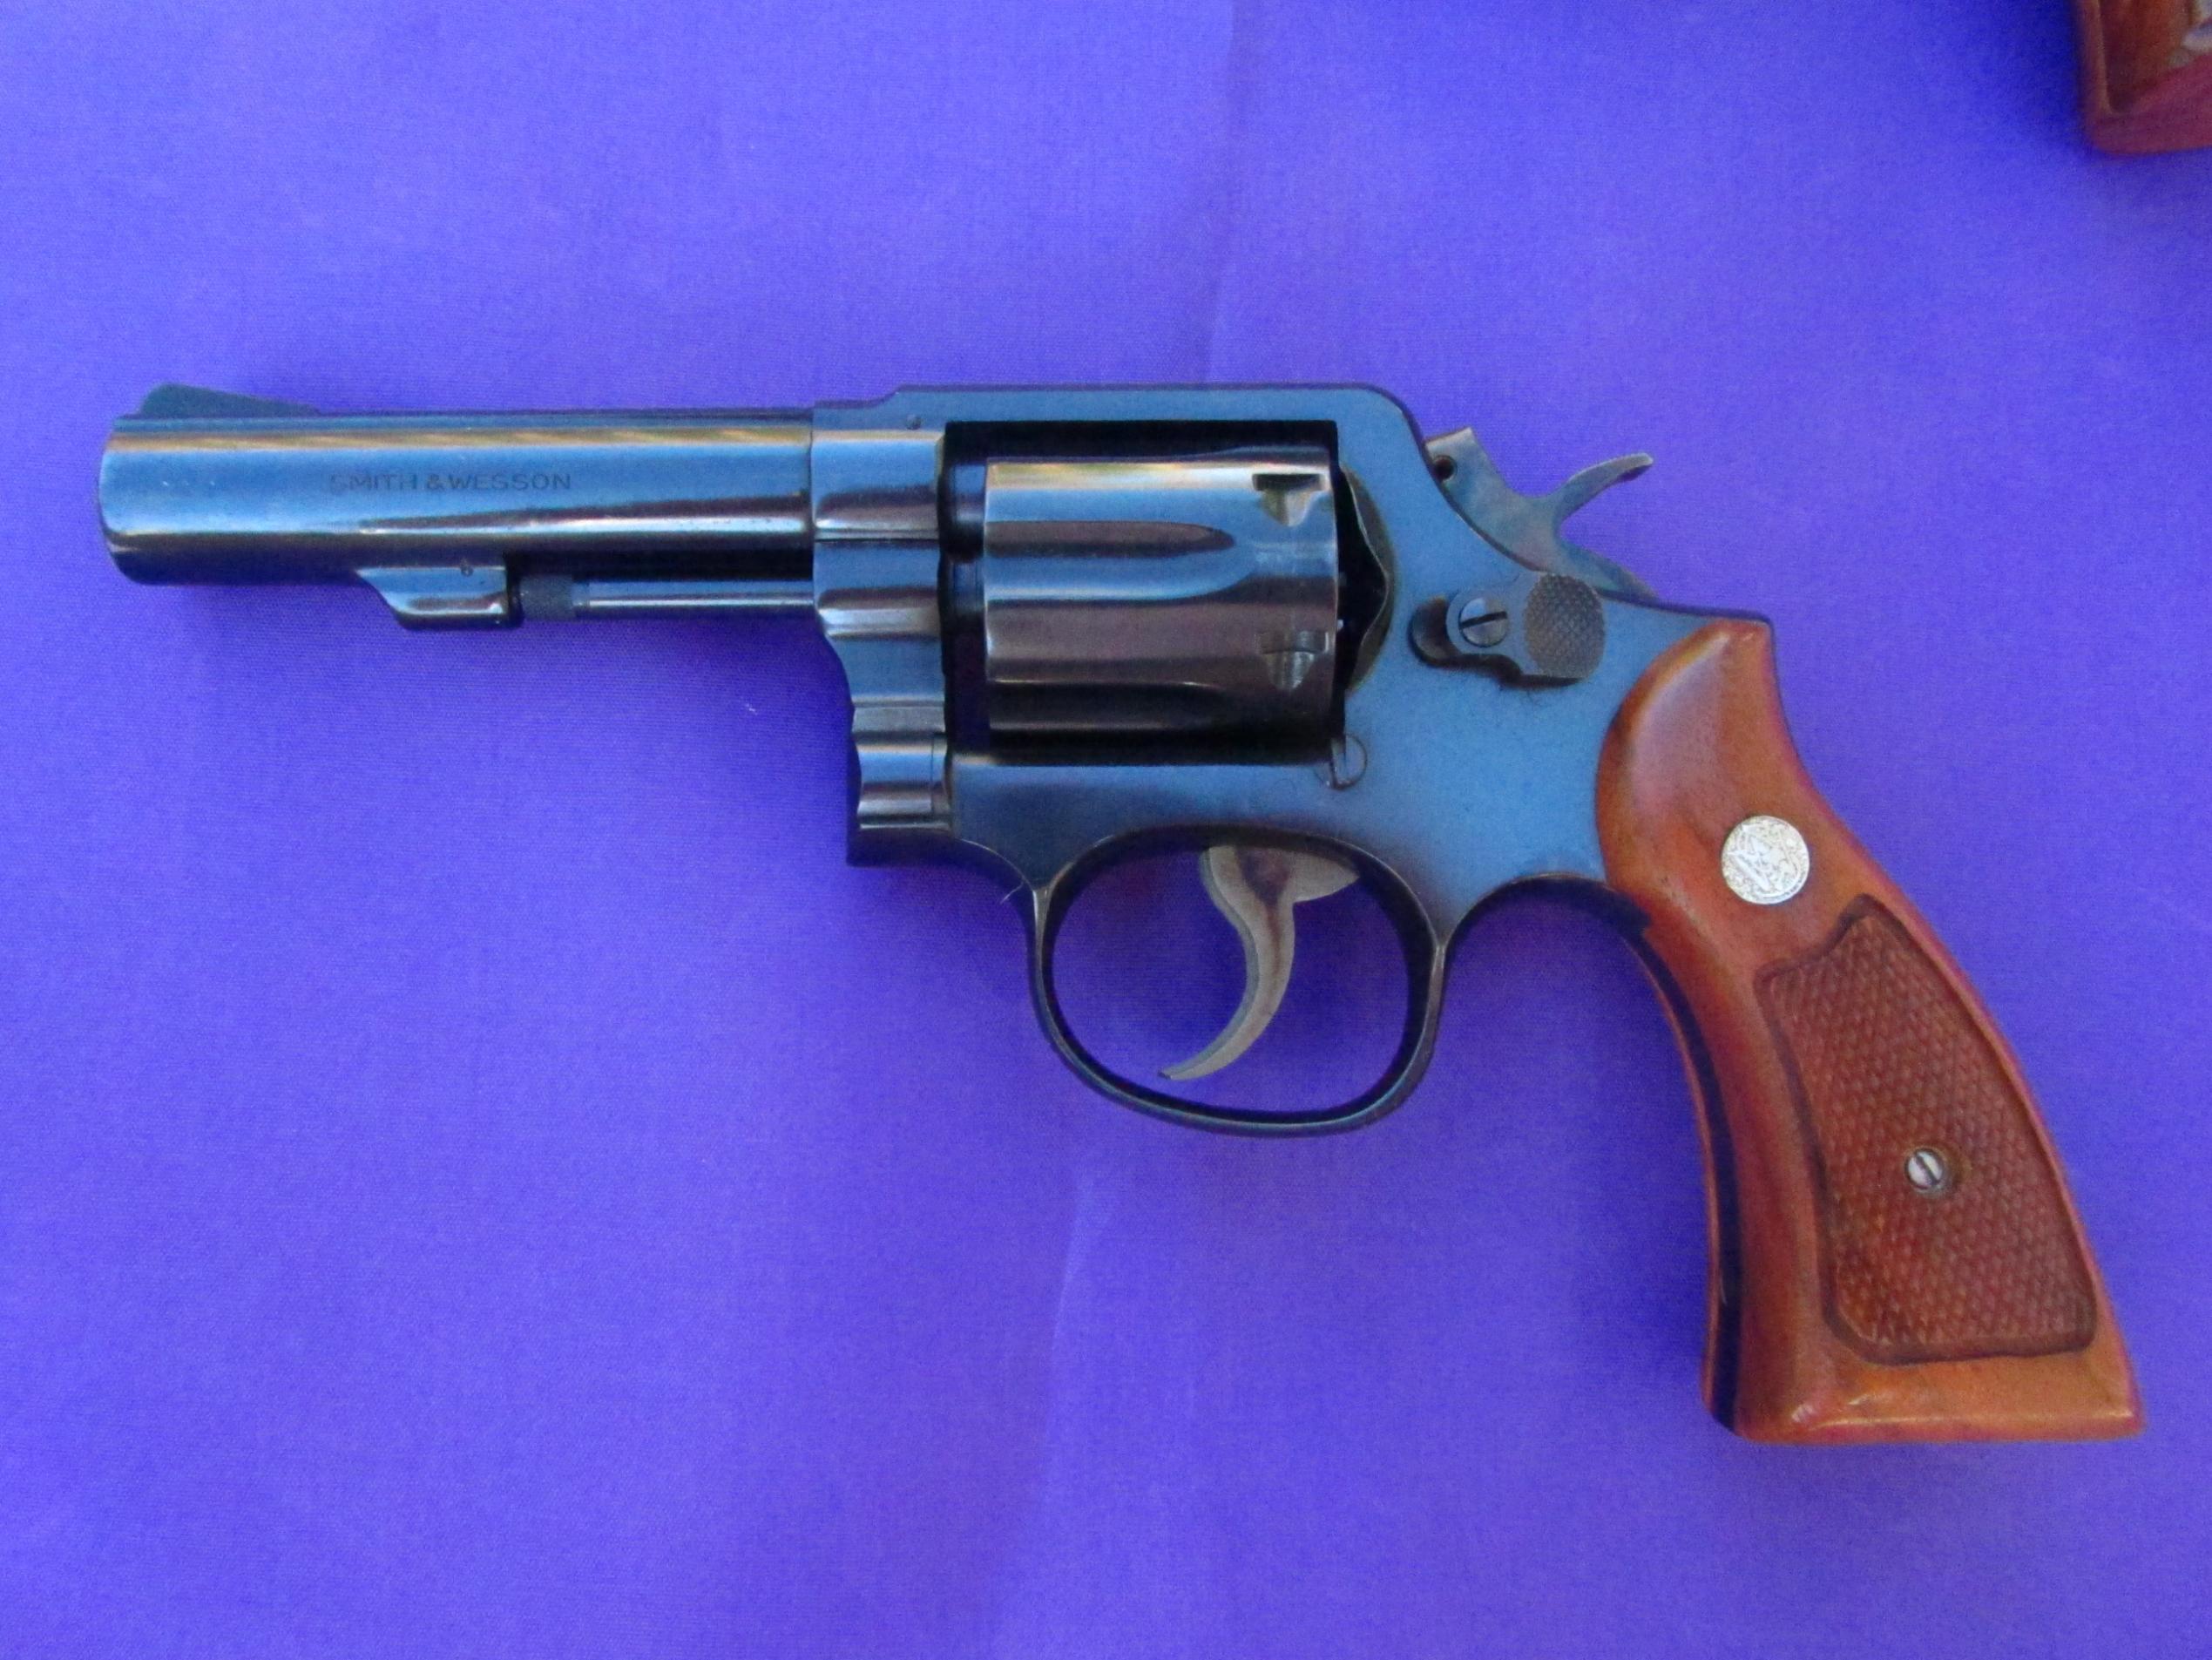 A Colt and a Smith-img_0537.jpg